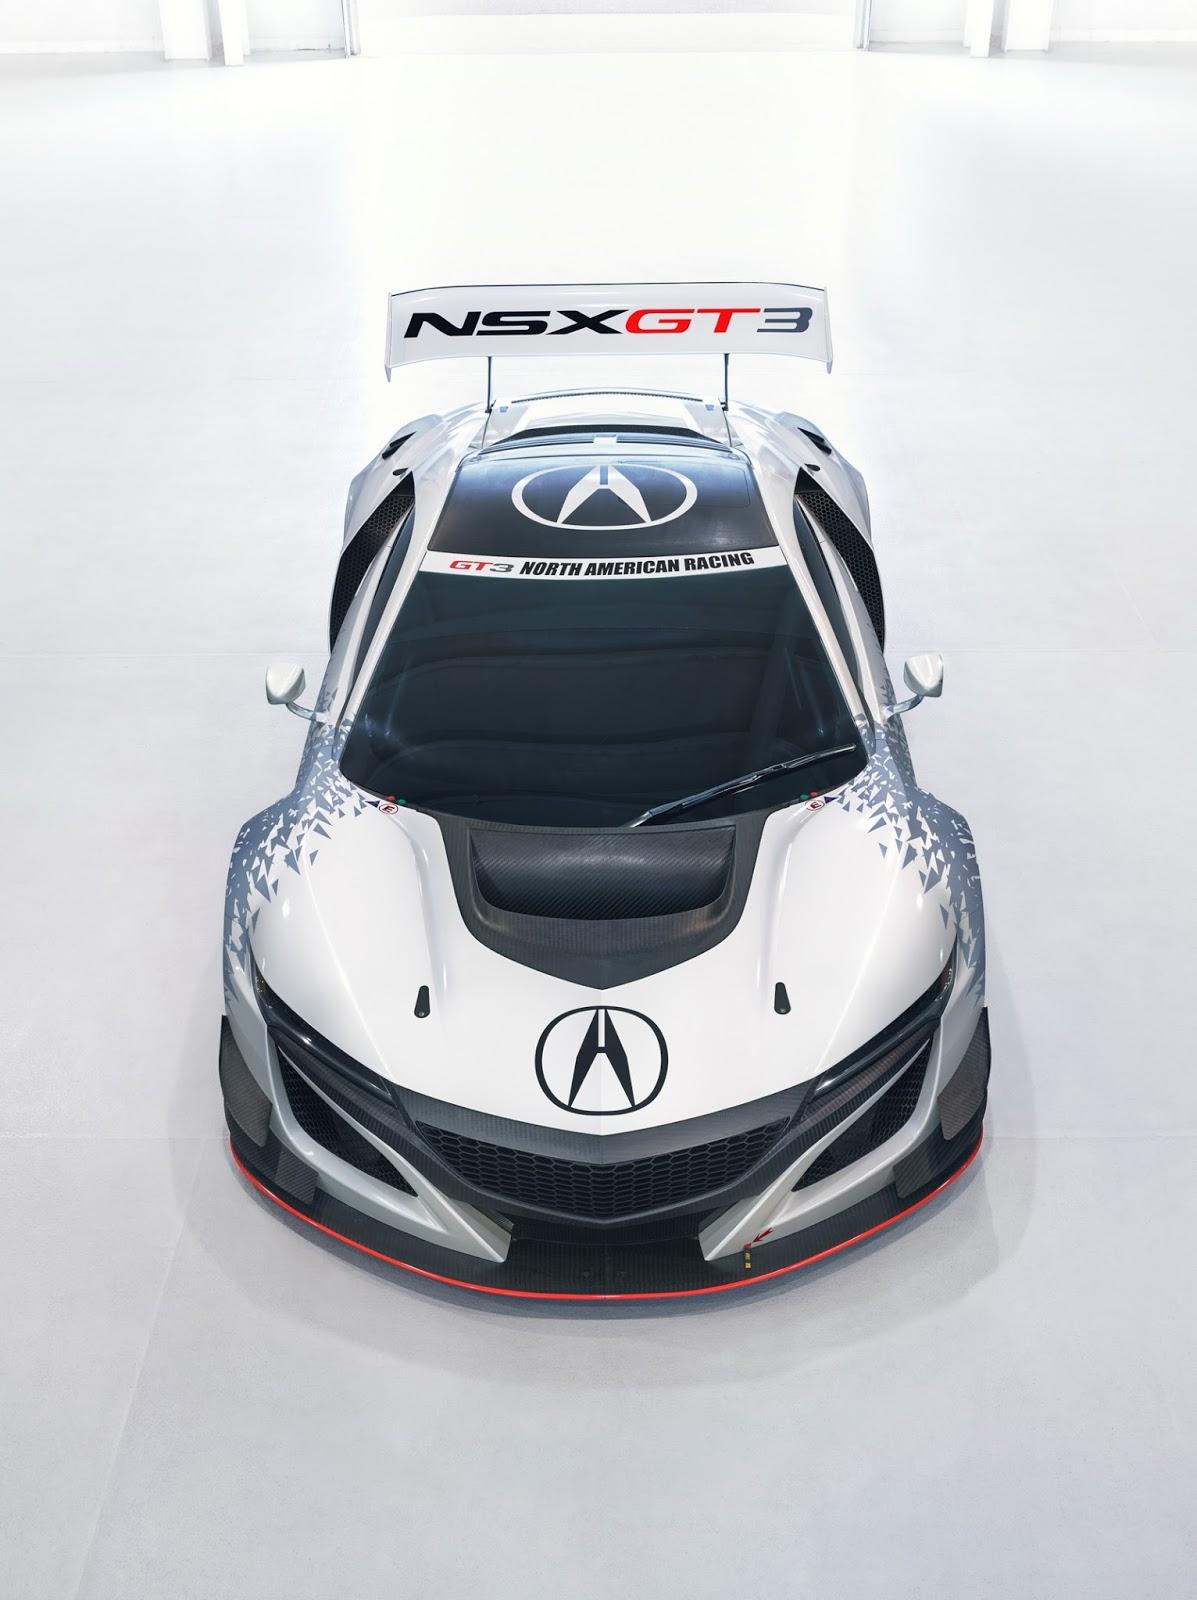 2015 - [Honda] NSX - Page 10 Acura-NSX-GT3-2